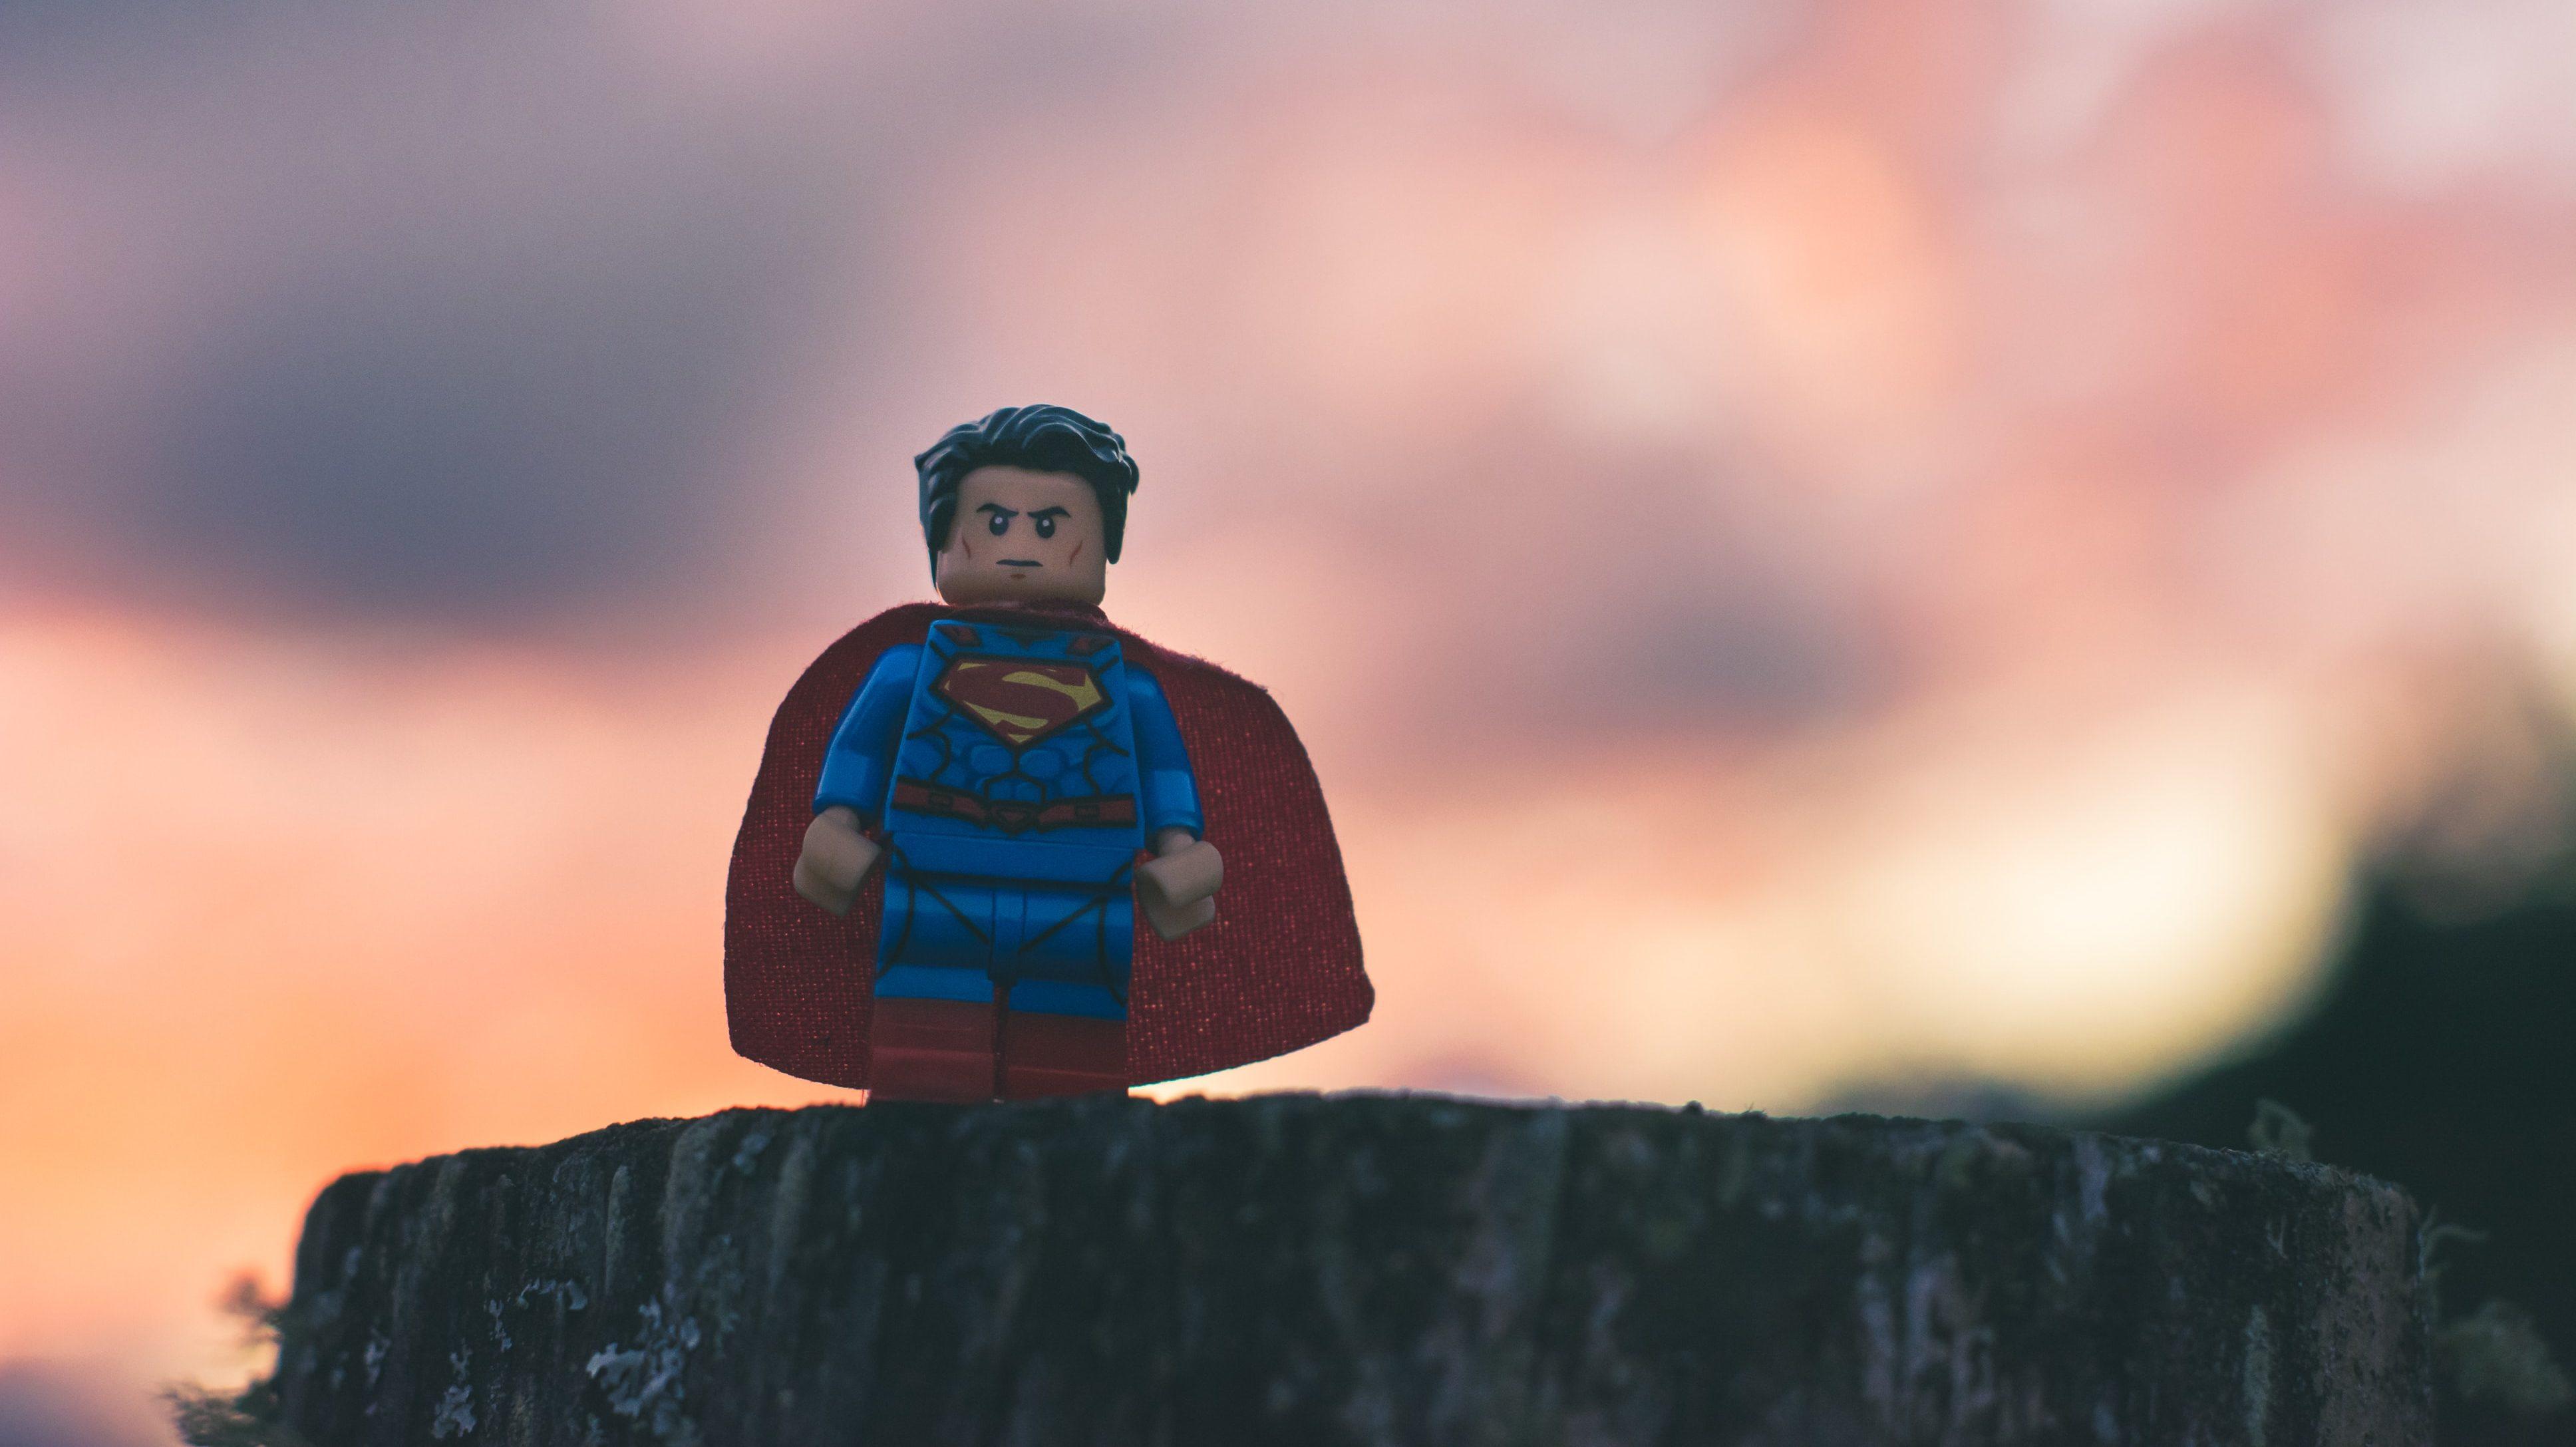 [Lu Ailleurs] : « Pour son entourage, Macron c'est Superman ! » Rym Momtaz